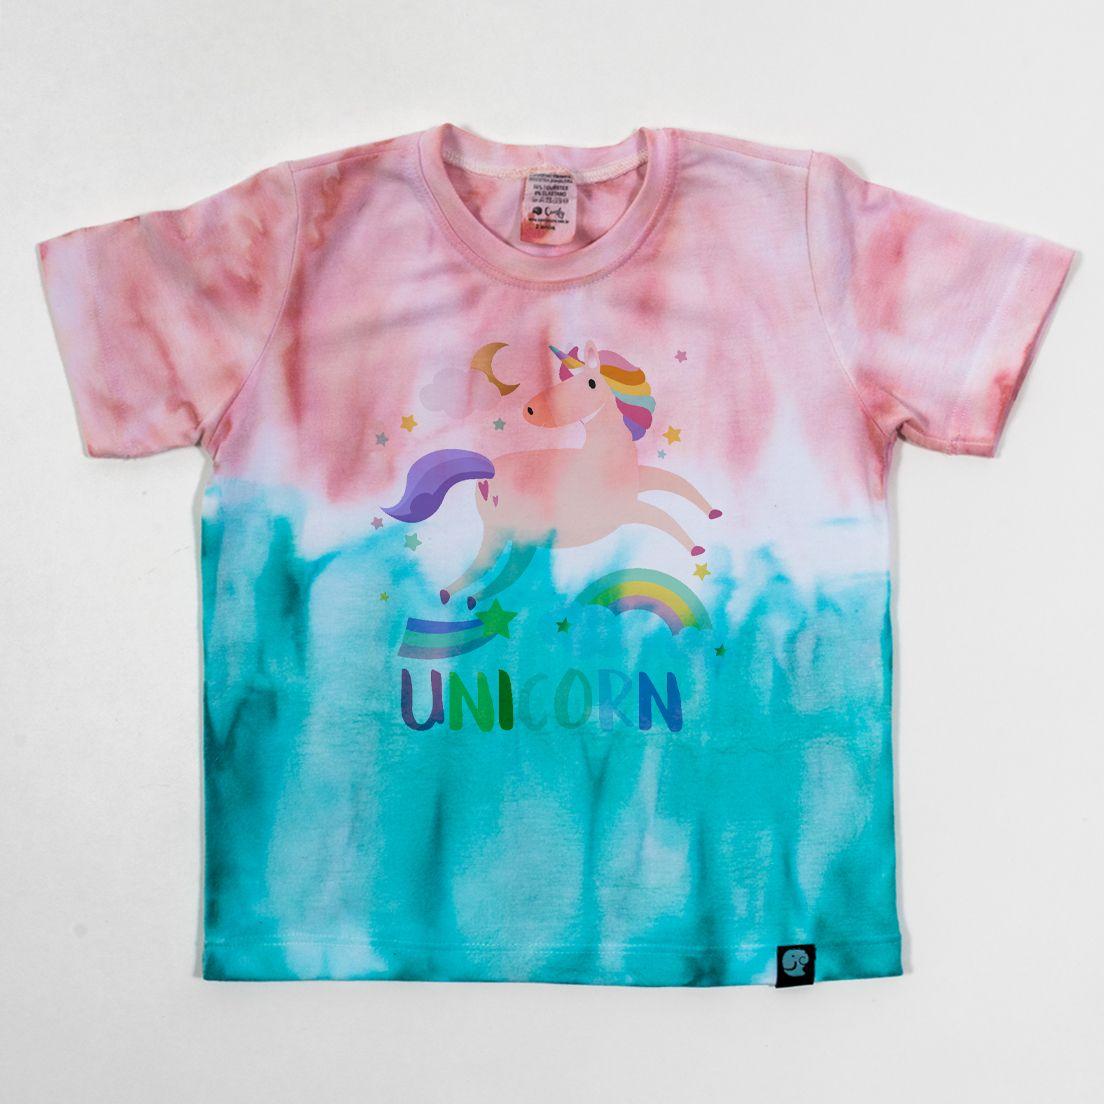 Camiseta Tie Dye Comfy Unicórnio